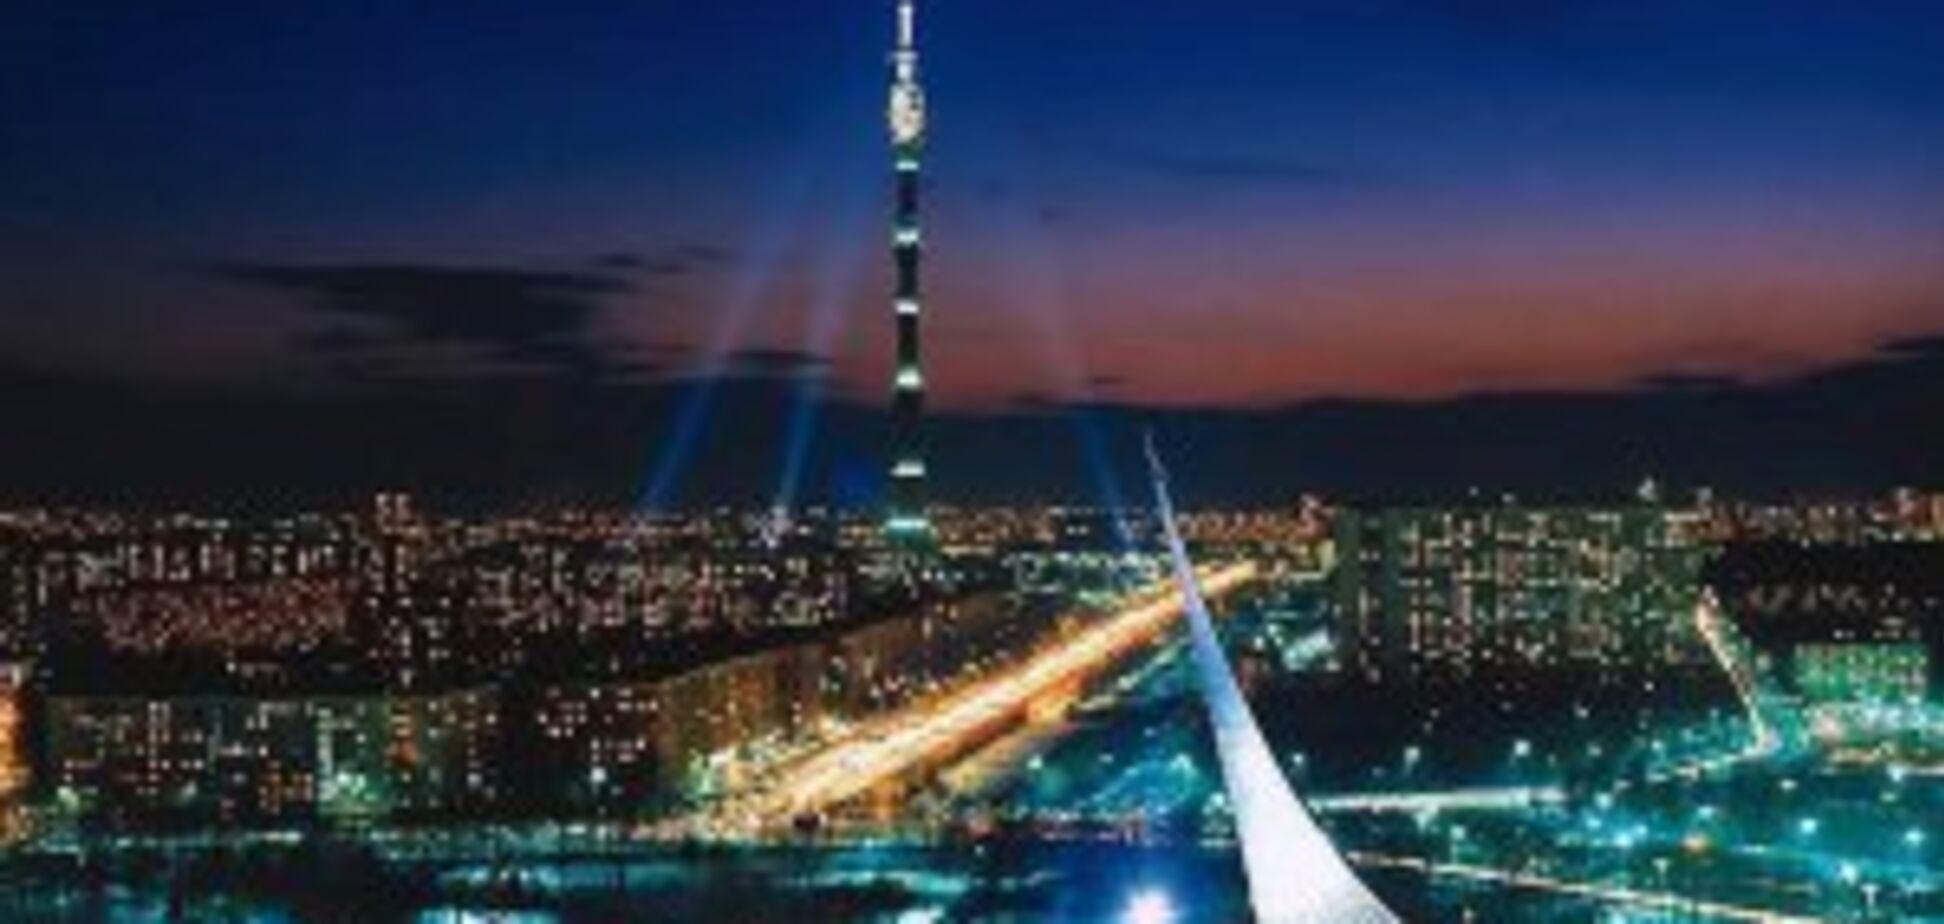 Чем ближе к Останкино – тем выше градус ненависти к Украине